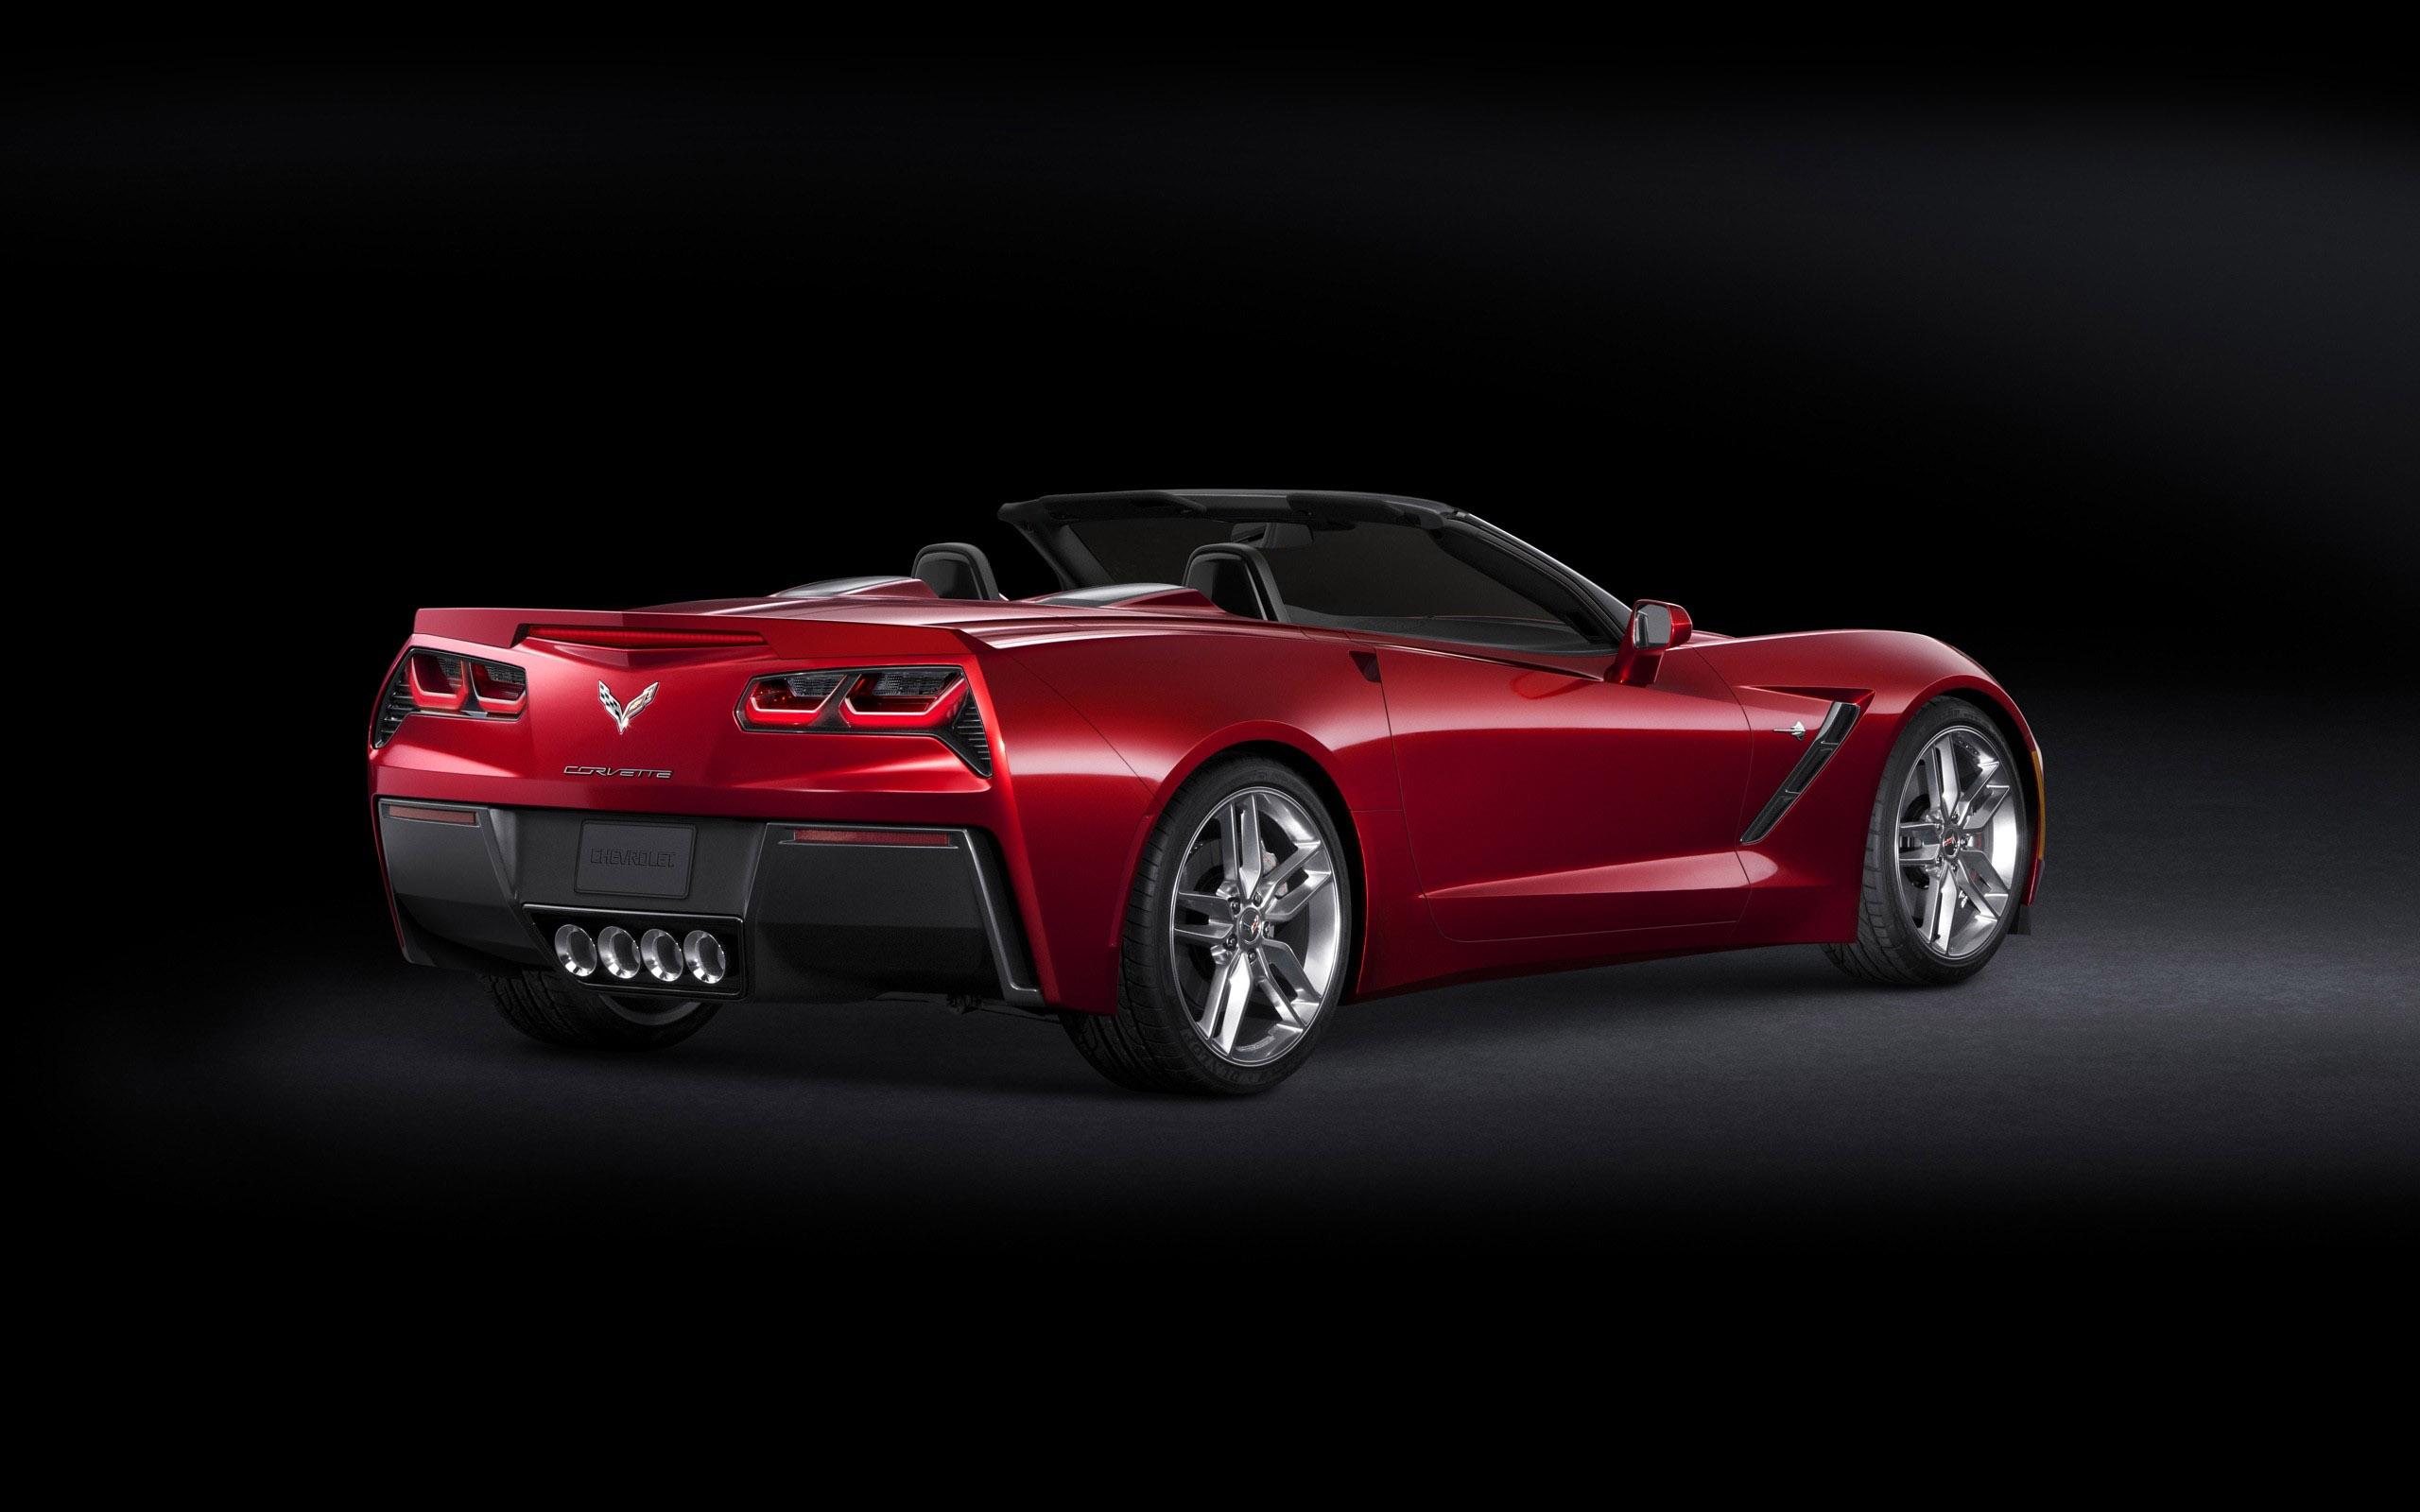 Обои дорогие автомобили 2560x1600 фото авто обои машины hd.